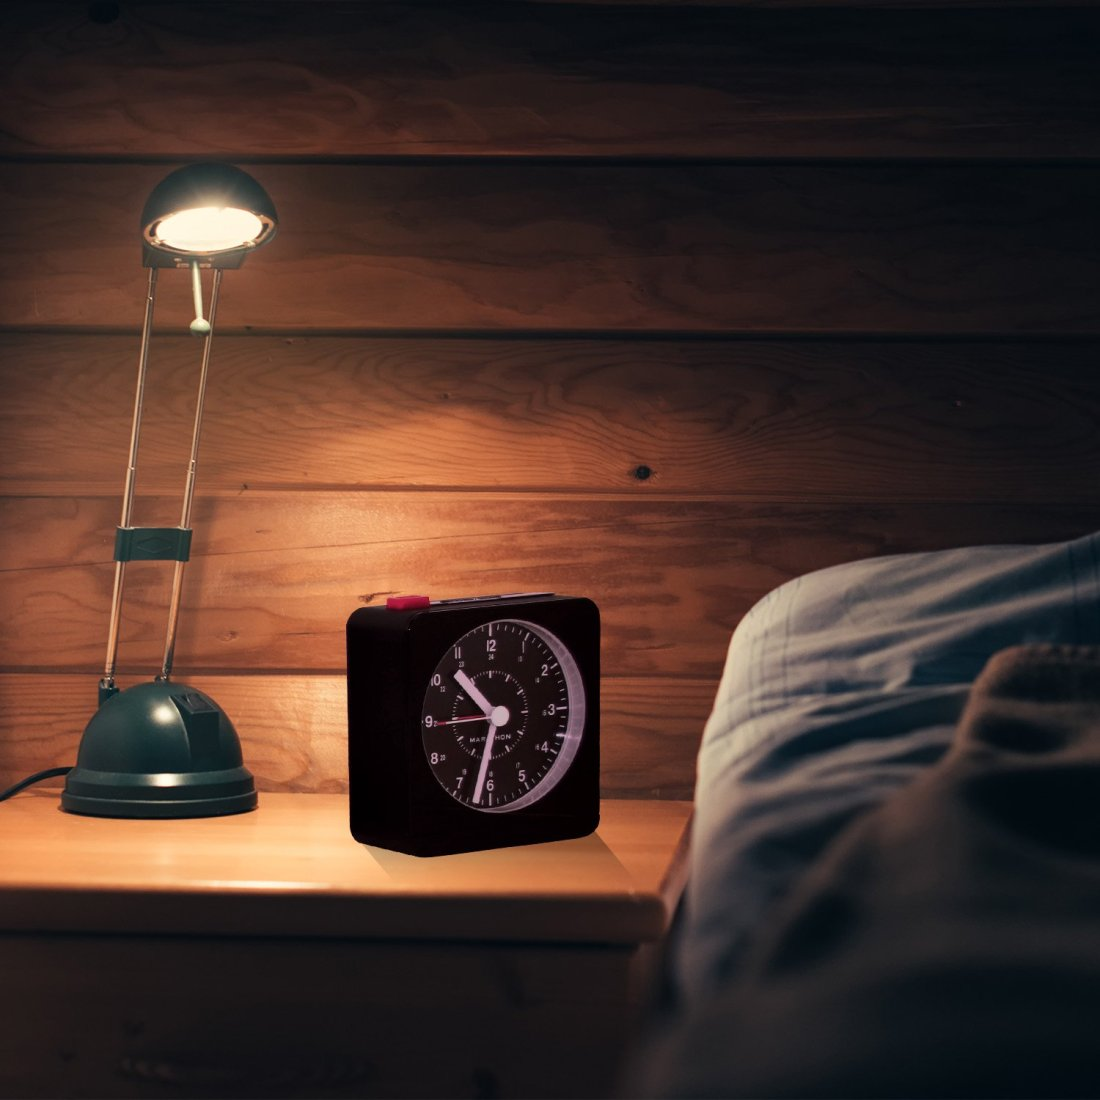 Analog-alarm-clock